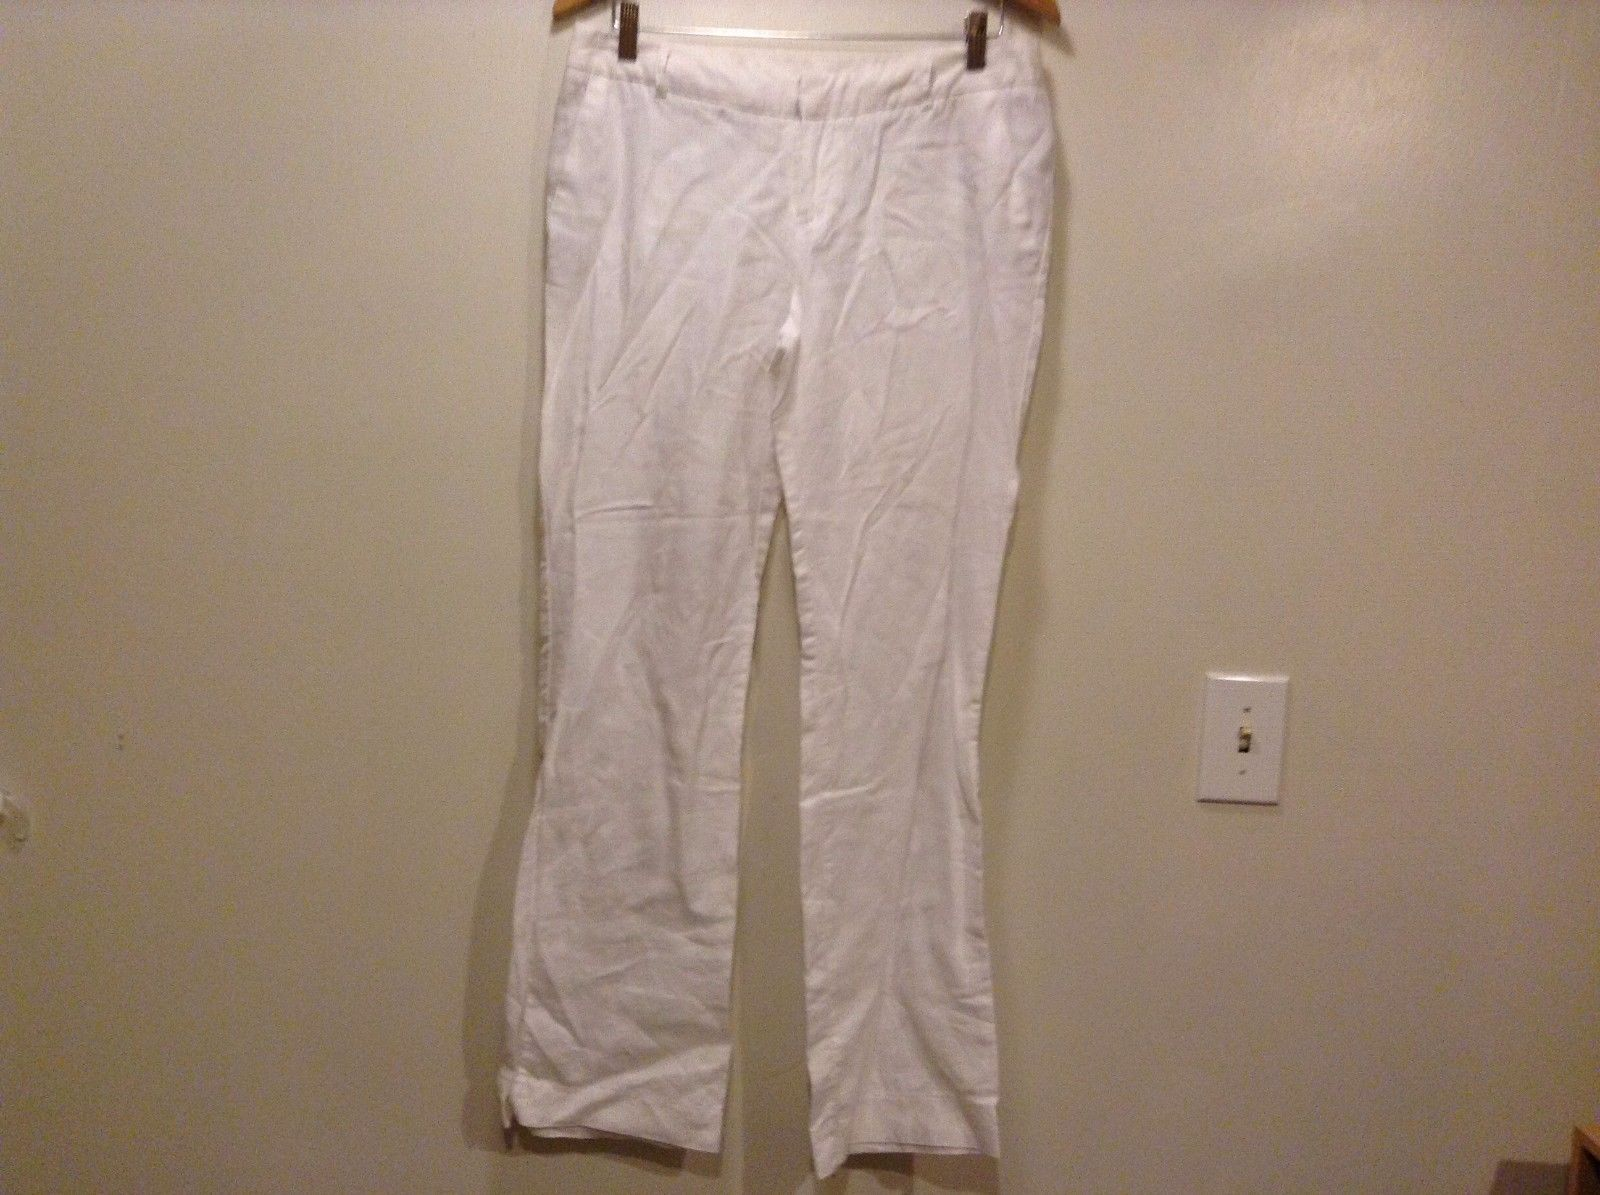 Great Condition White Pants Zipper Button Clip